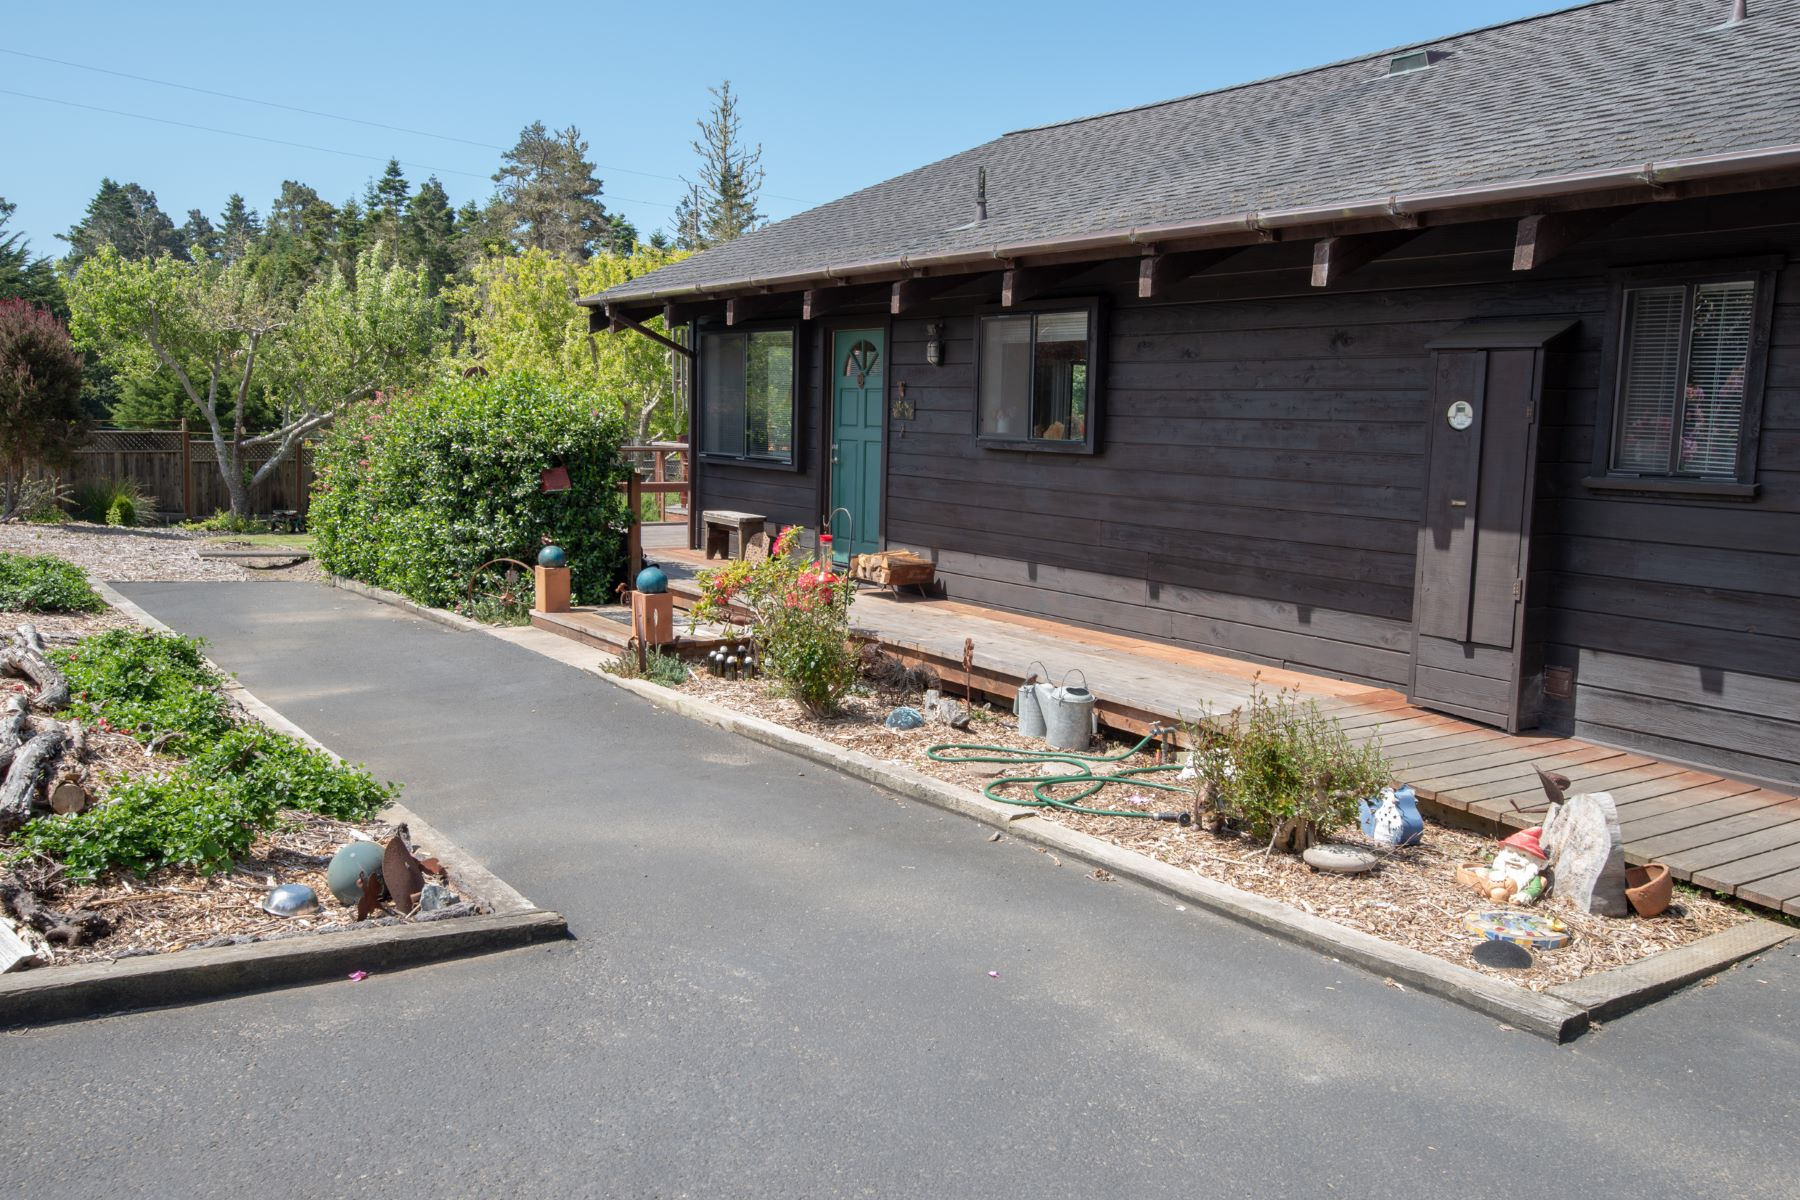 Additional photo for property listing at Mendocino Coastal Home 13150 Point Cabrillo Drive Mendocino, California 95460 United States